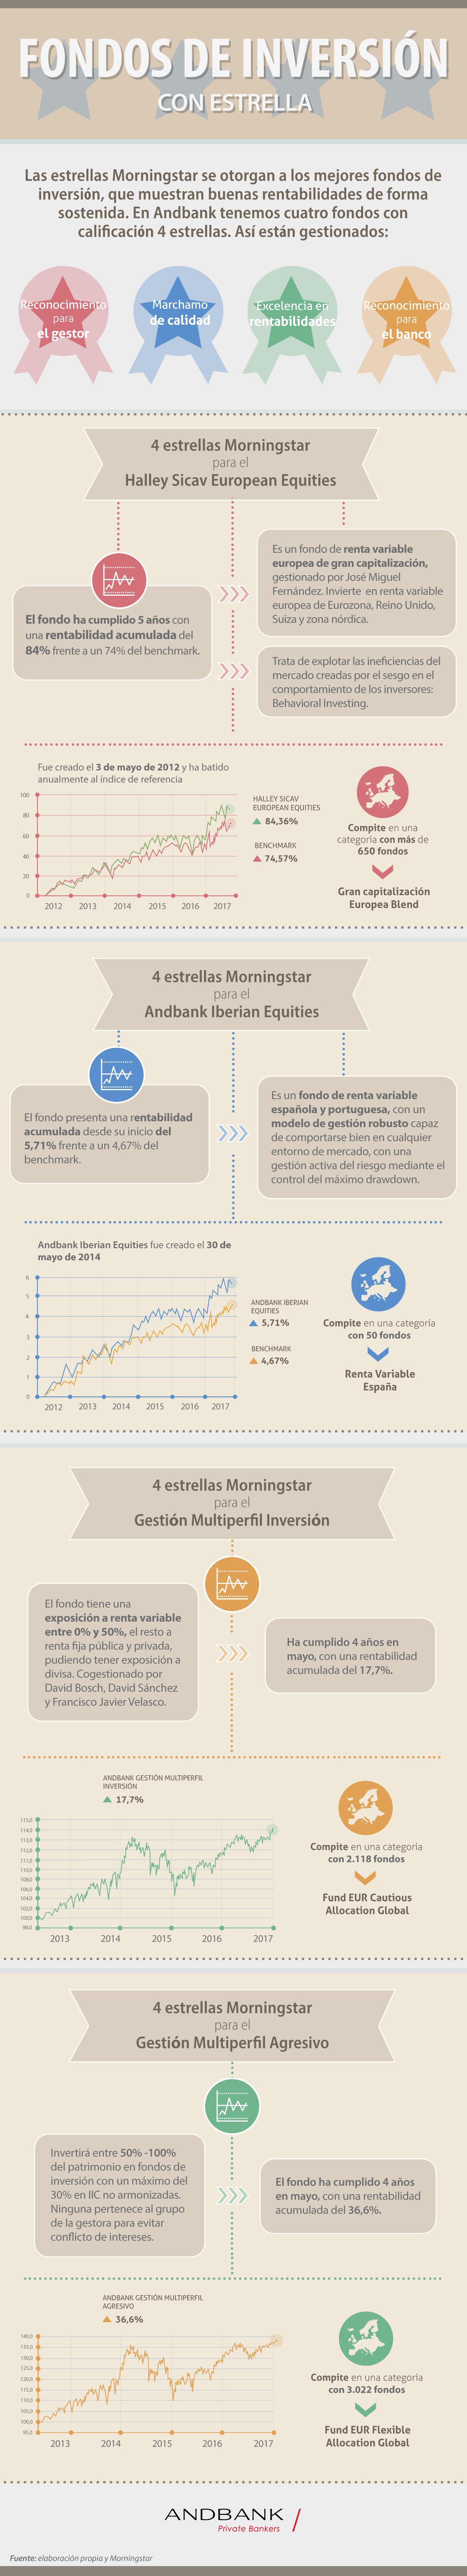 Andbank infografia fondos de inversion